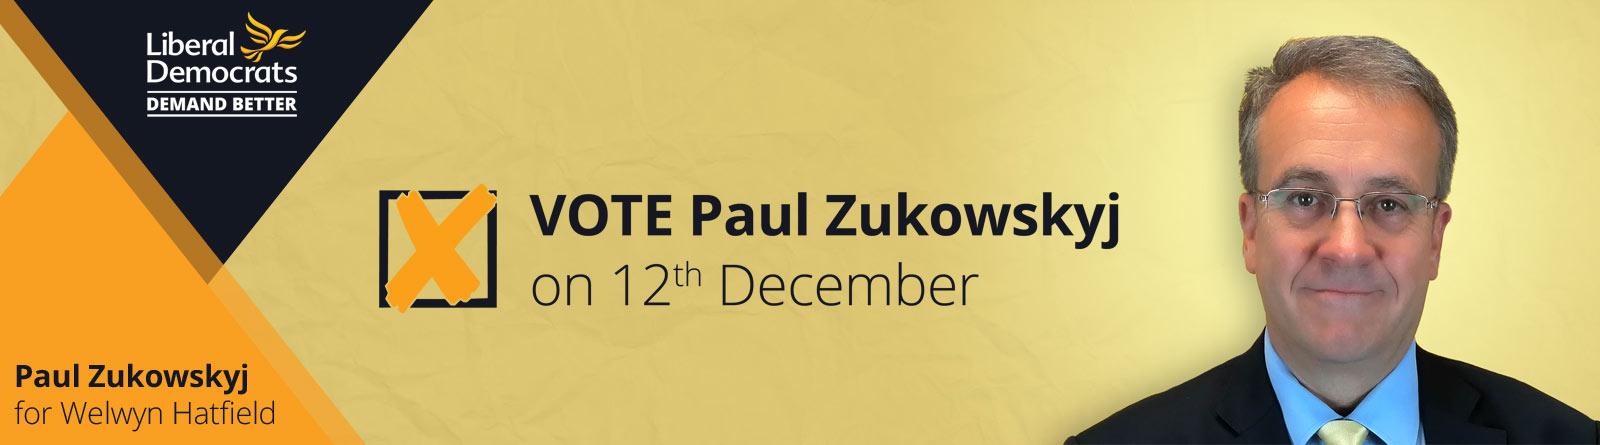 Vote Paul Zukowskyj on December 12th